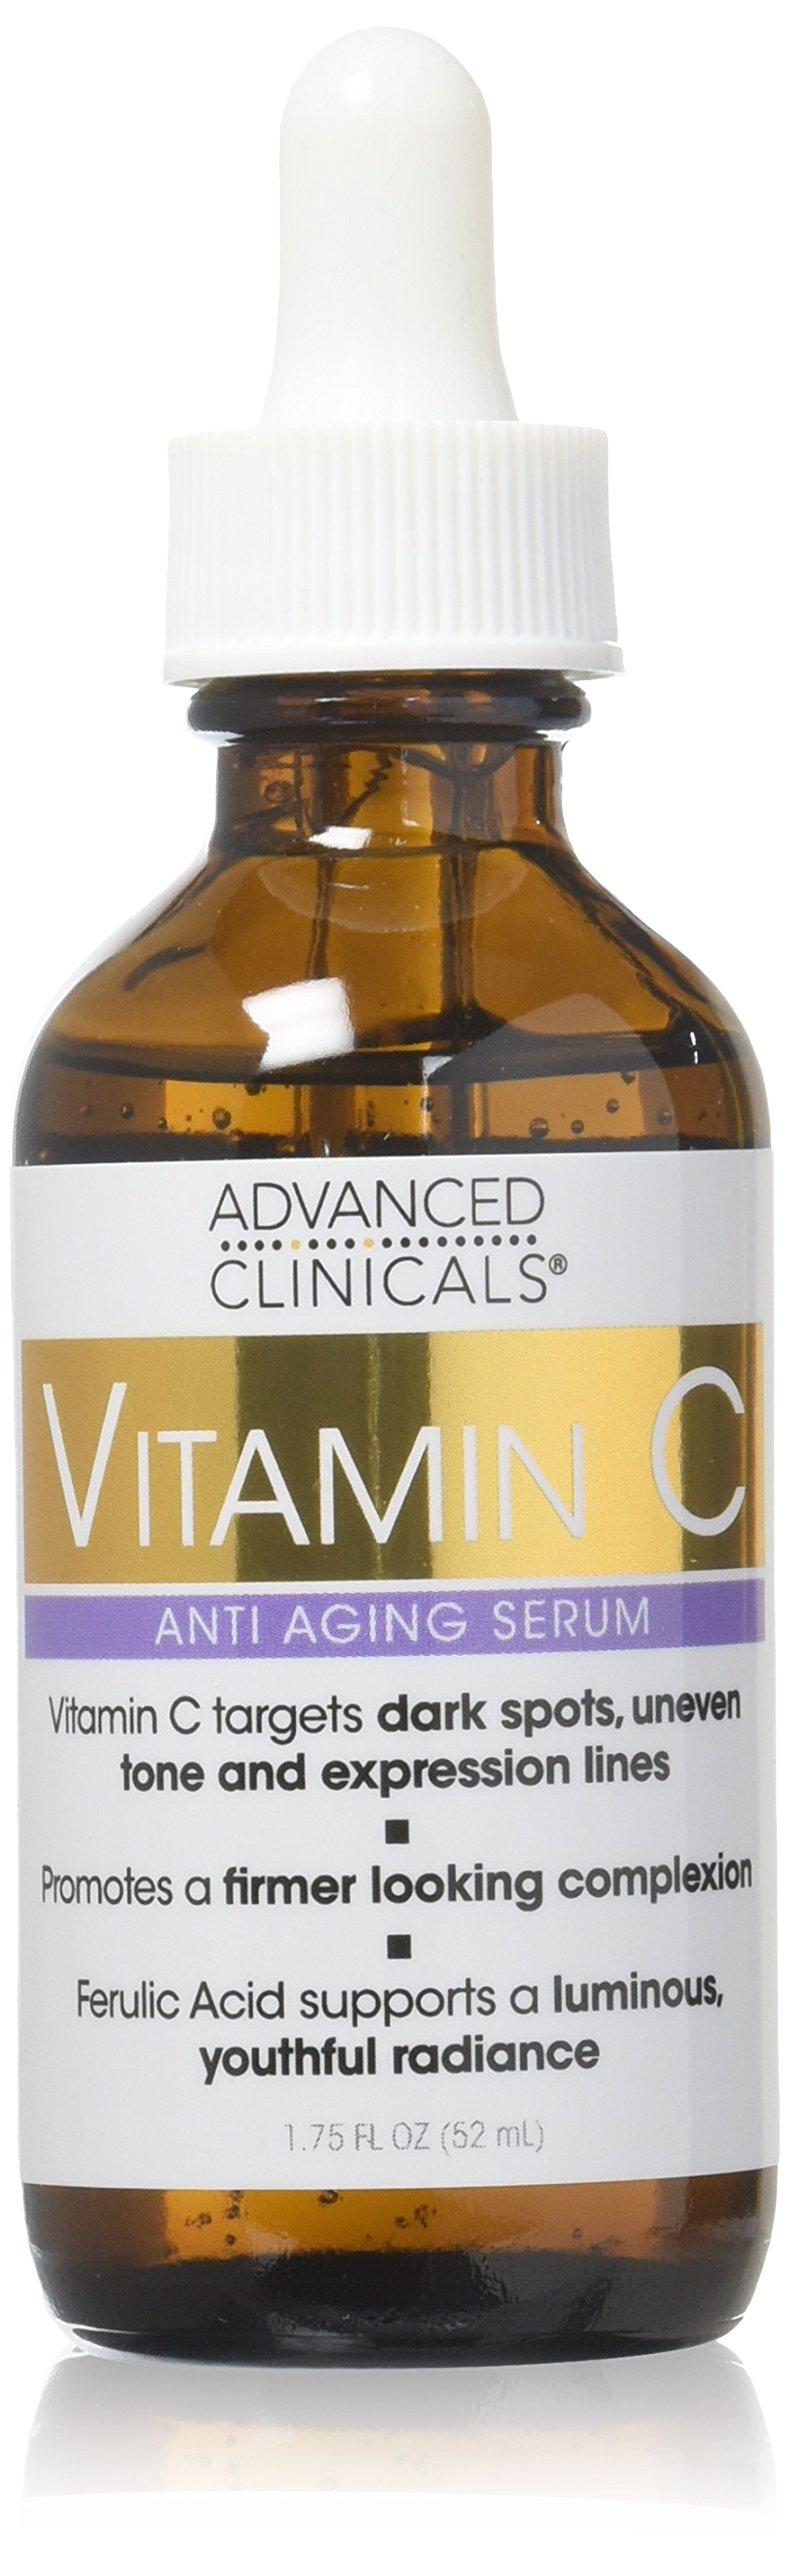 Advanced Clinicals Vitamin C Anti-aging Serum for Dark Spots, Uneven Skin Tone,